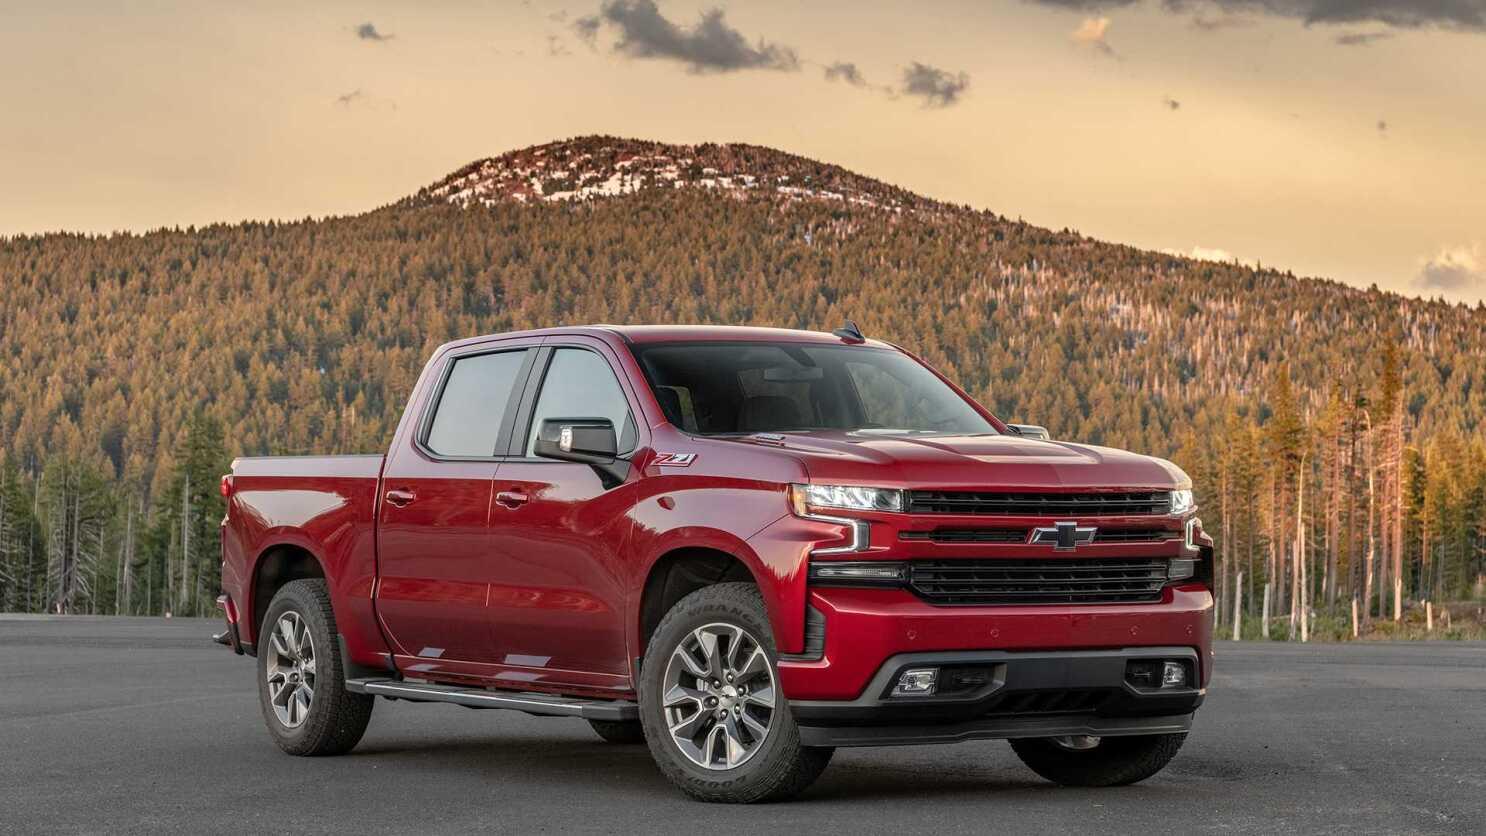 2020 Silverado 1500 Diesel Redesign